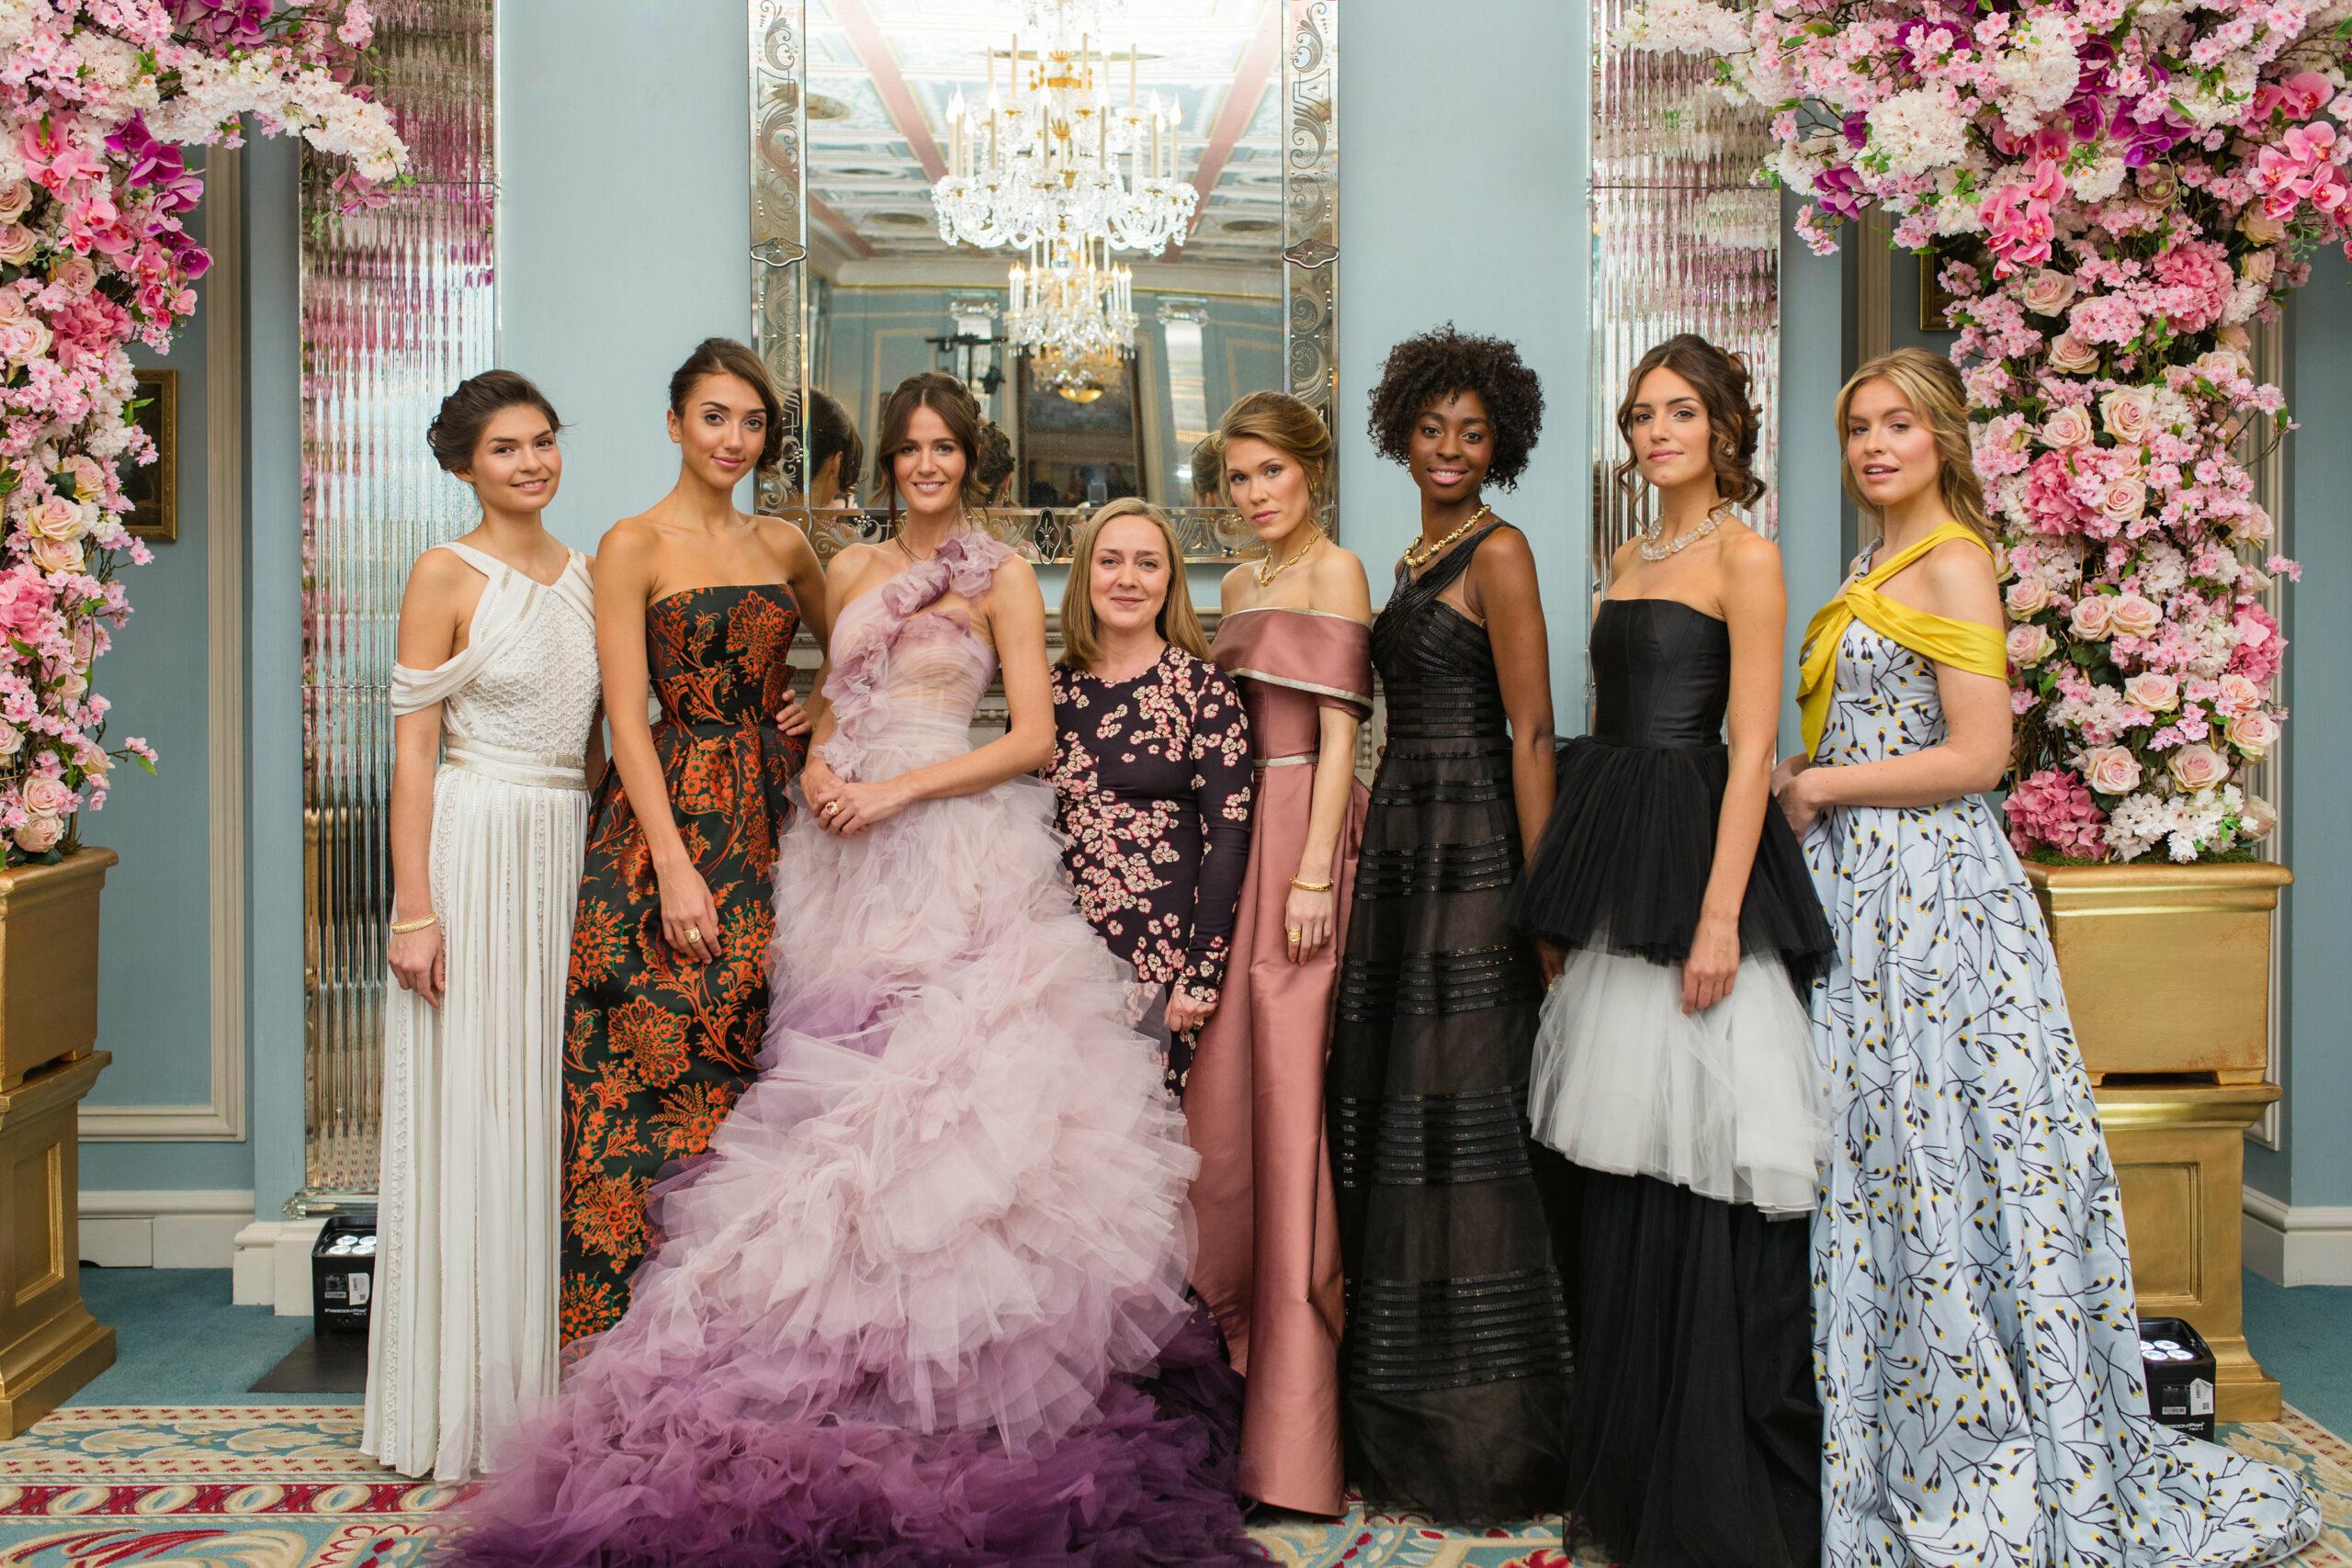 Elizabeth Gage partners with Brides in Belgravia